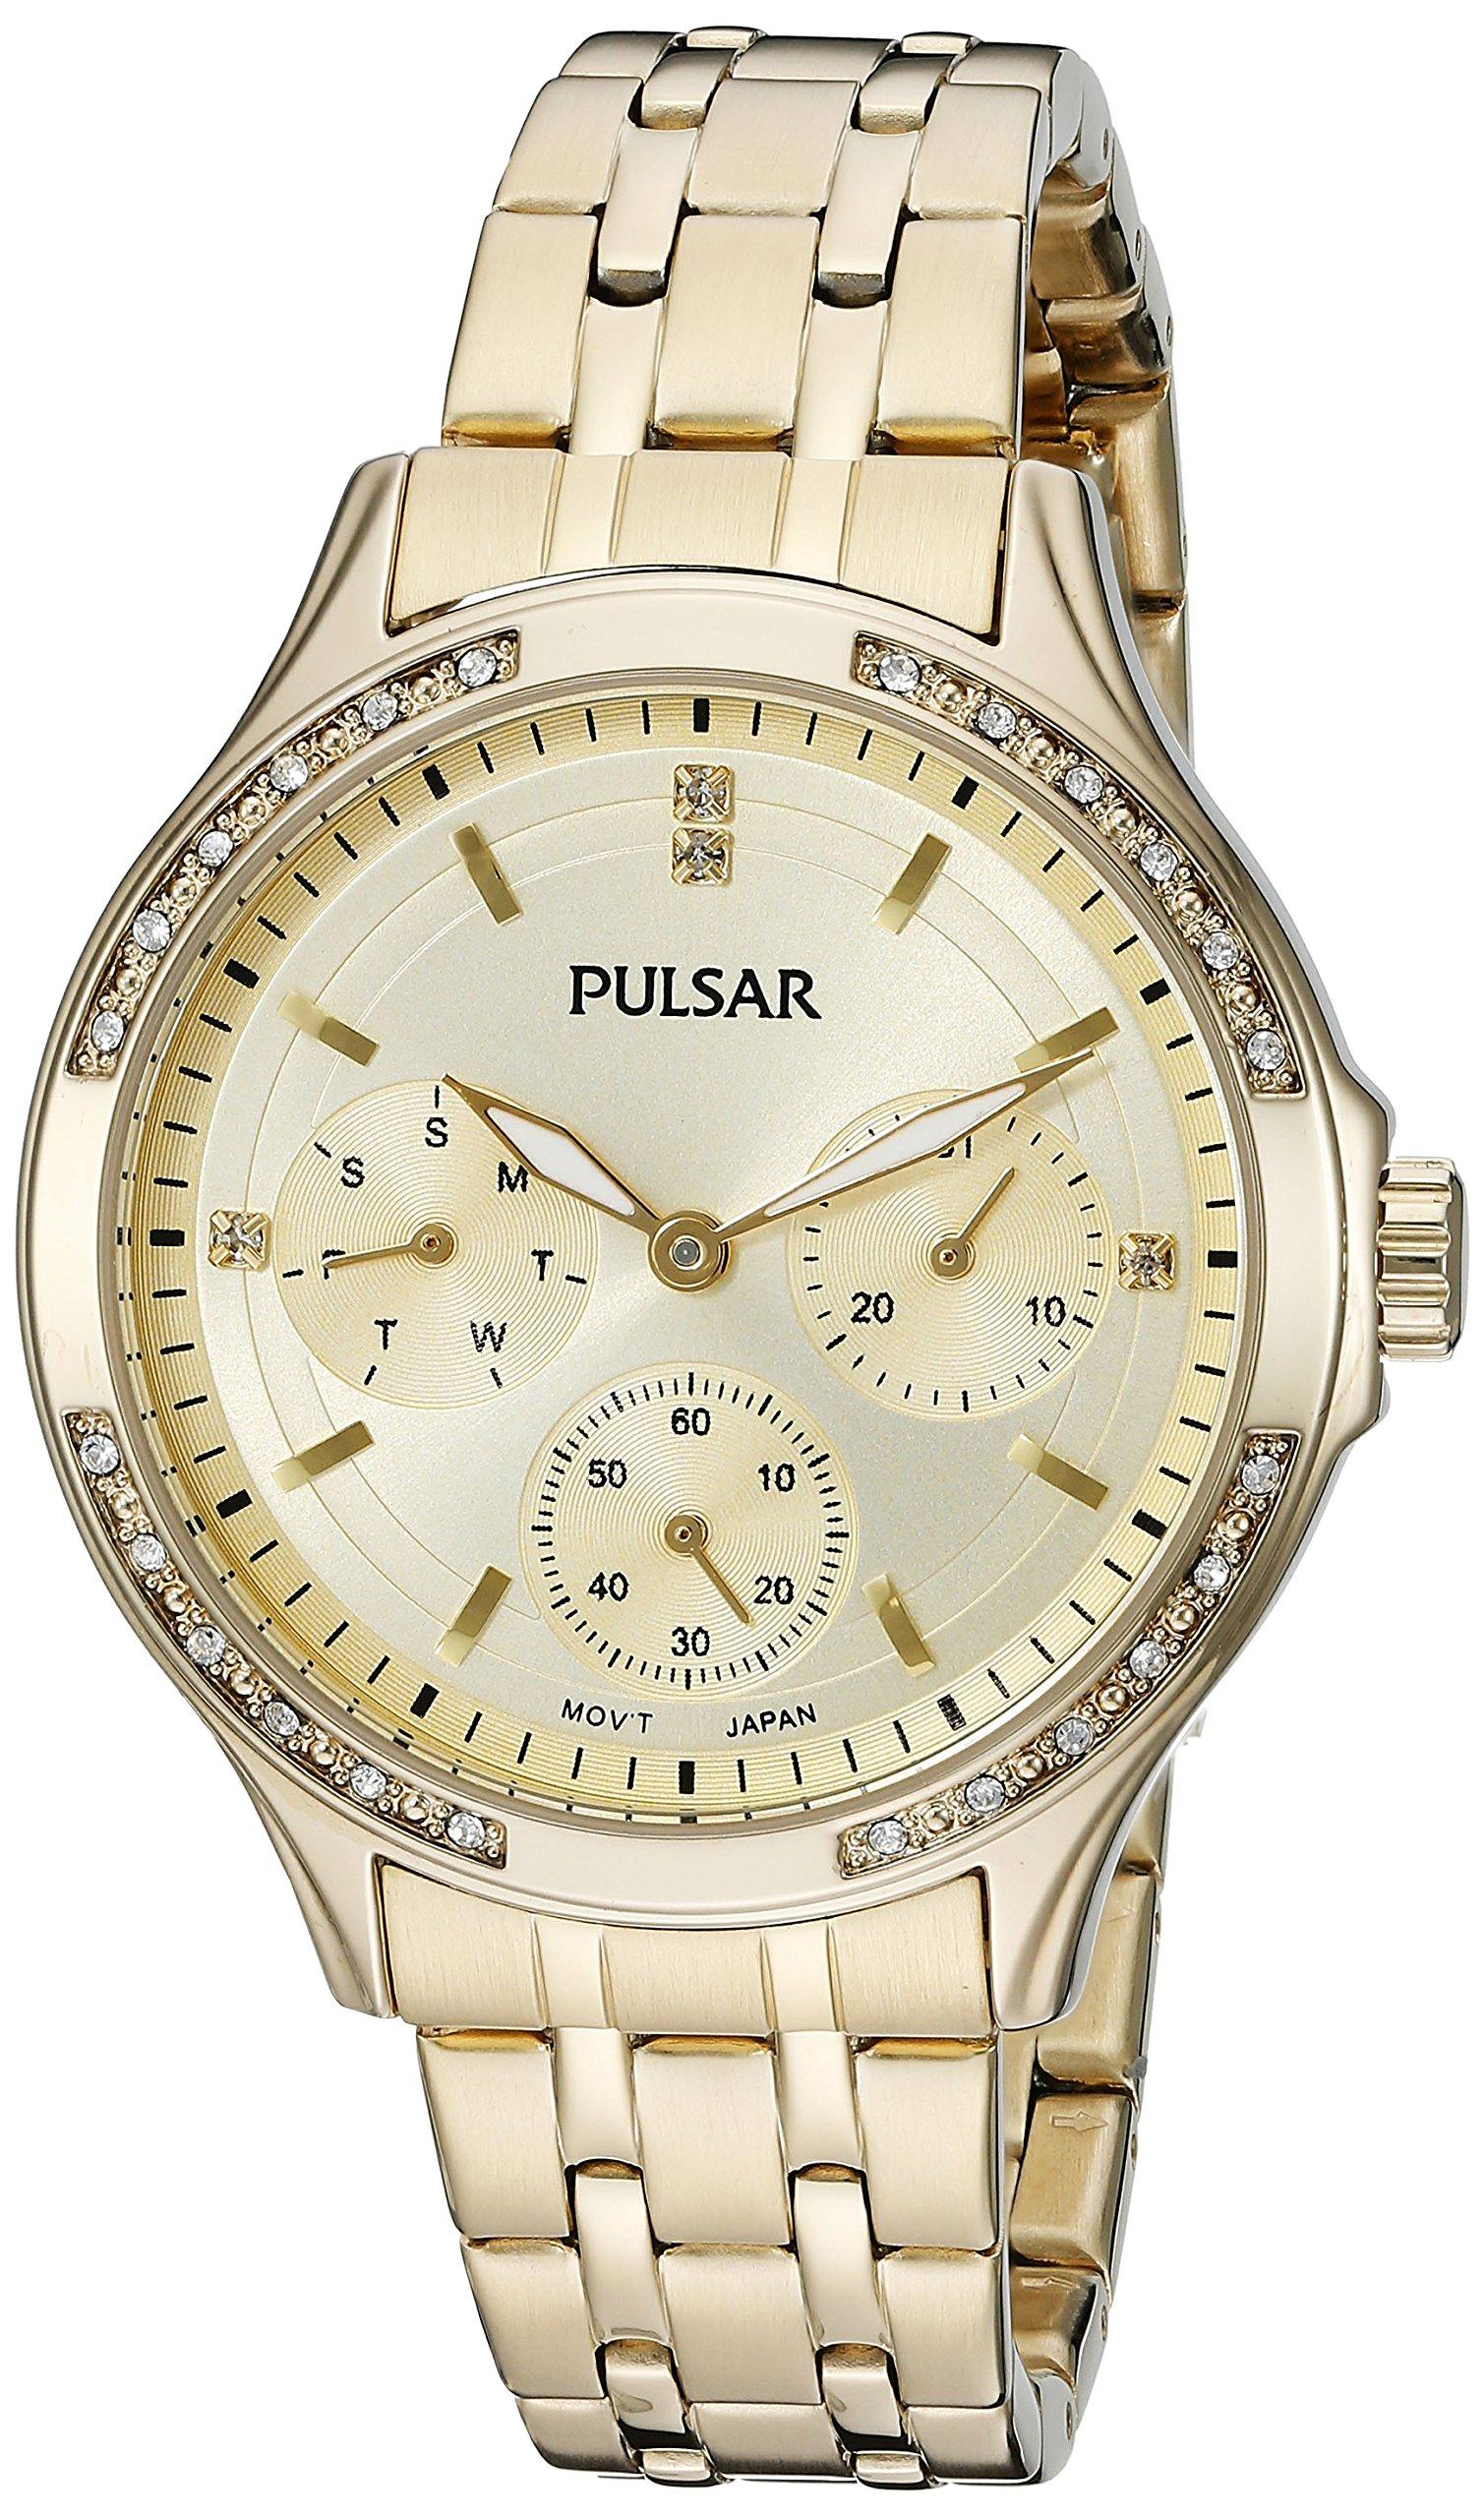 Pulsar Women's PP6190 Chronograph Analog Display Japanese Quartz Gold Watch by Pulsar